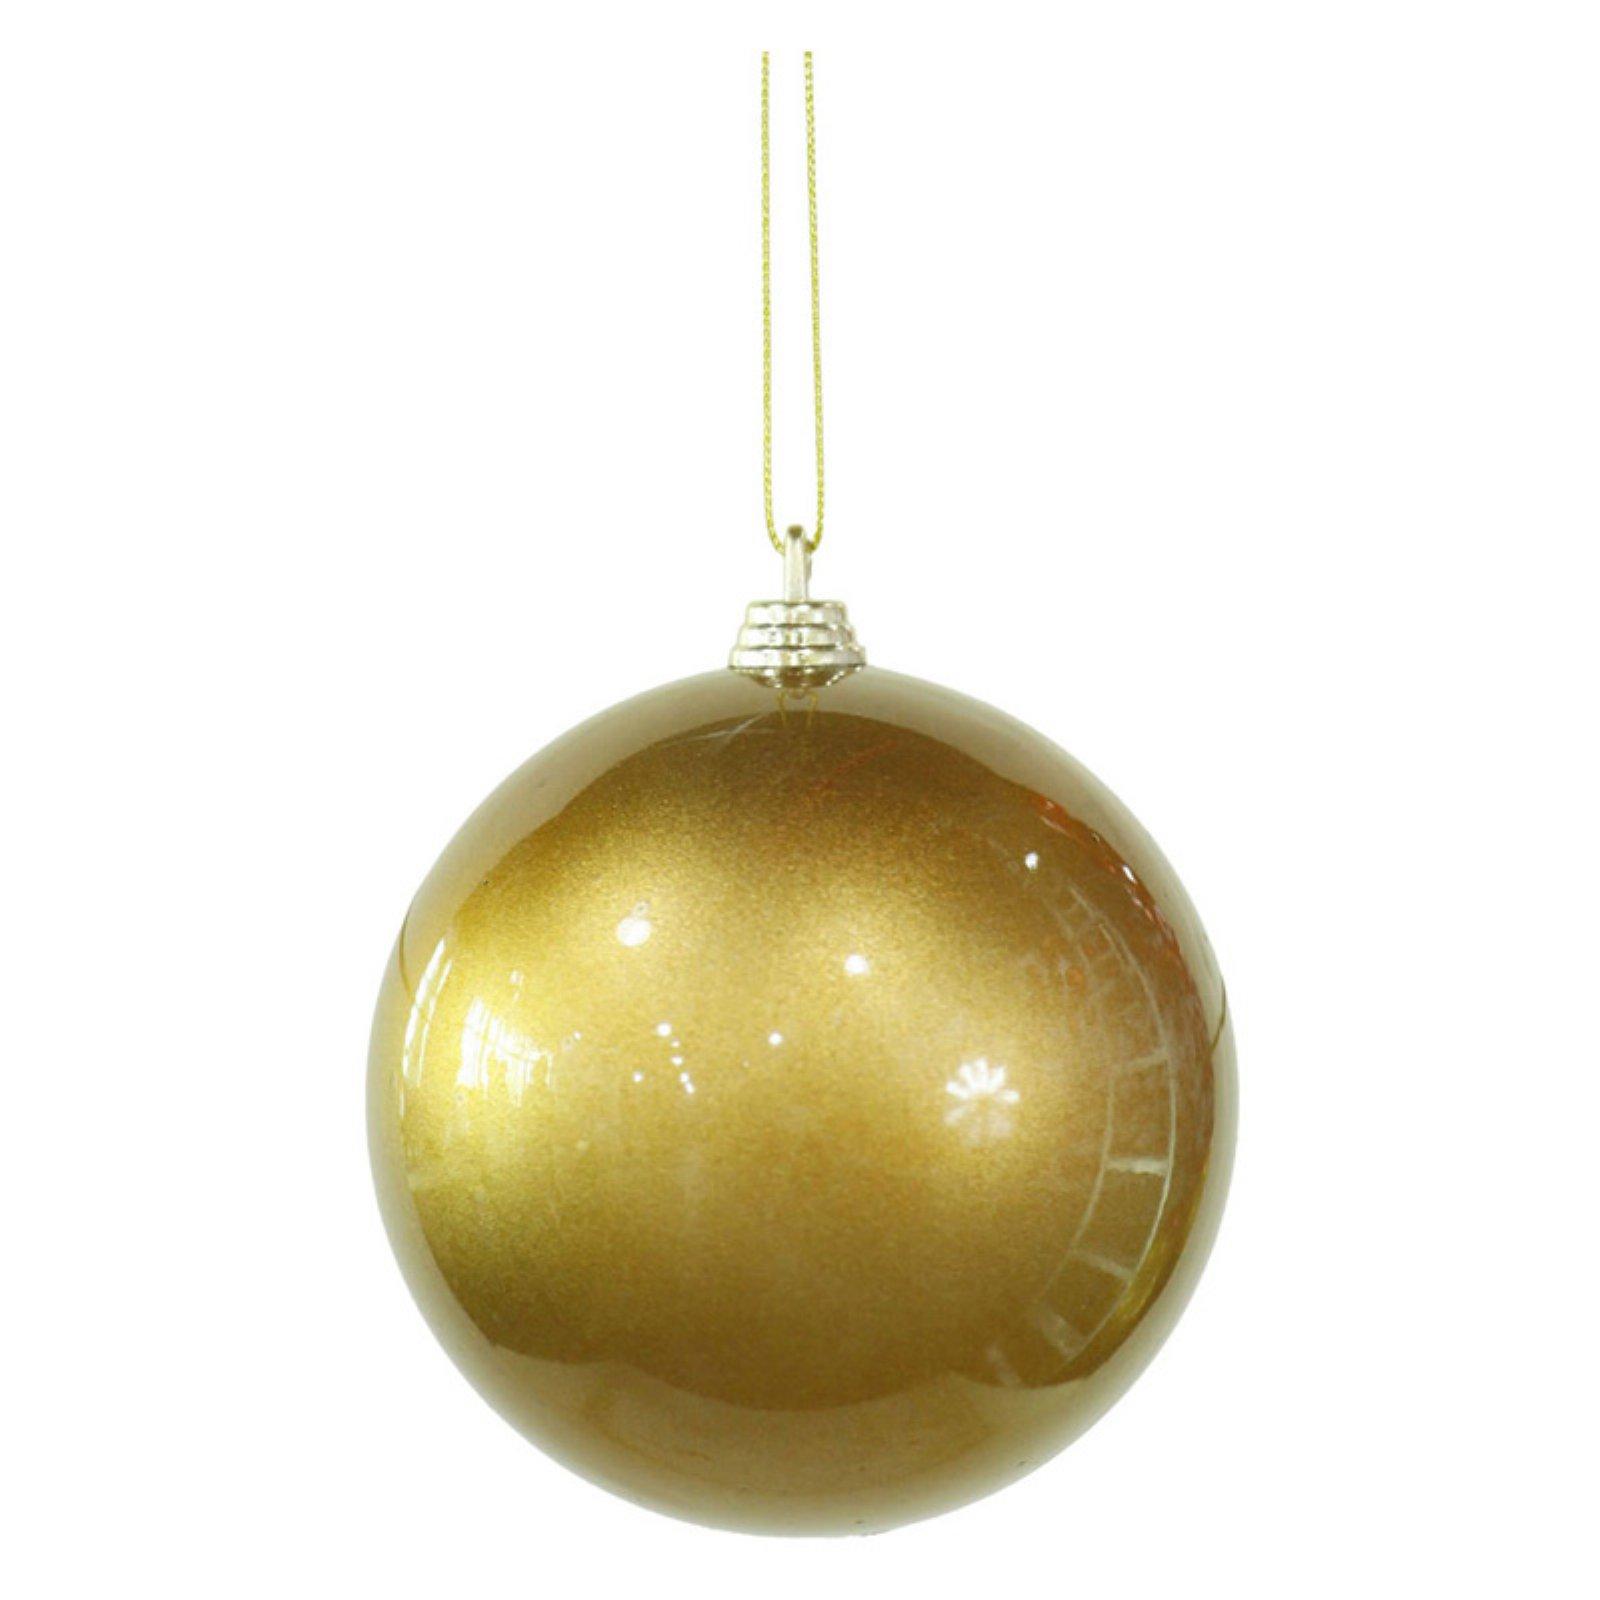 "Vickerman 4"" Candy Finish Ball Christmas Ornaments, Pack of 4"